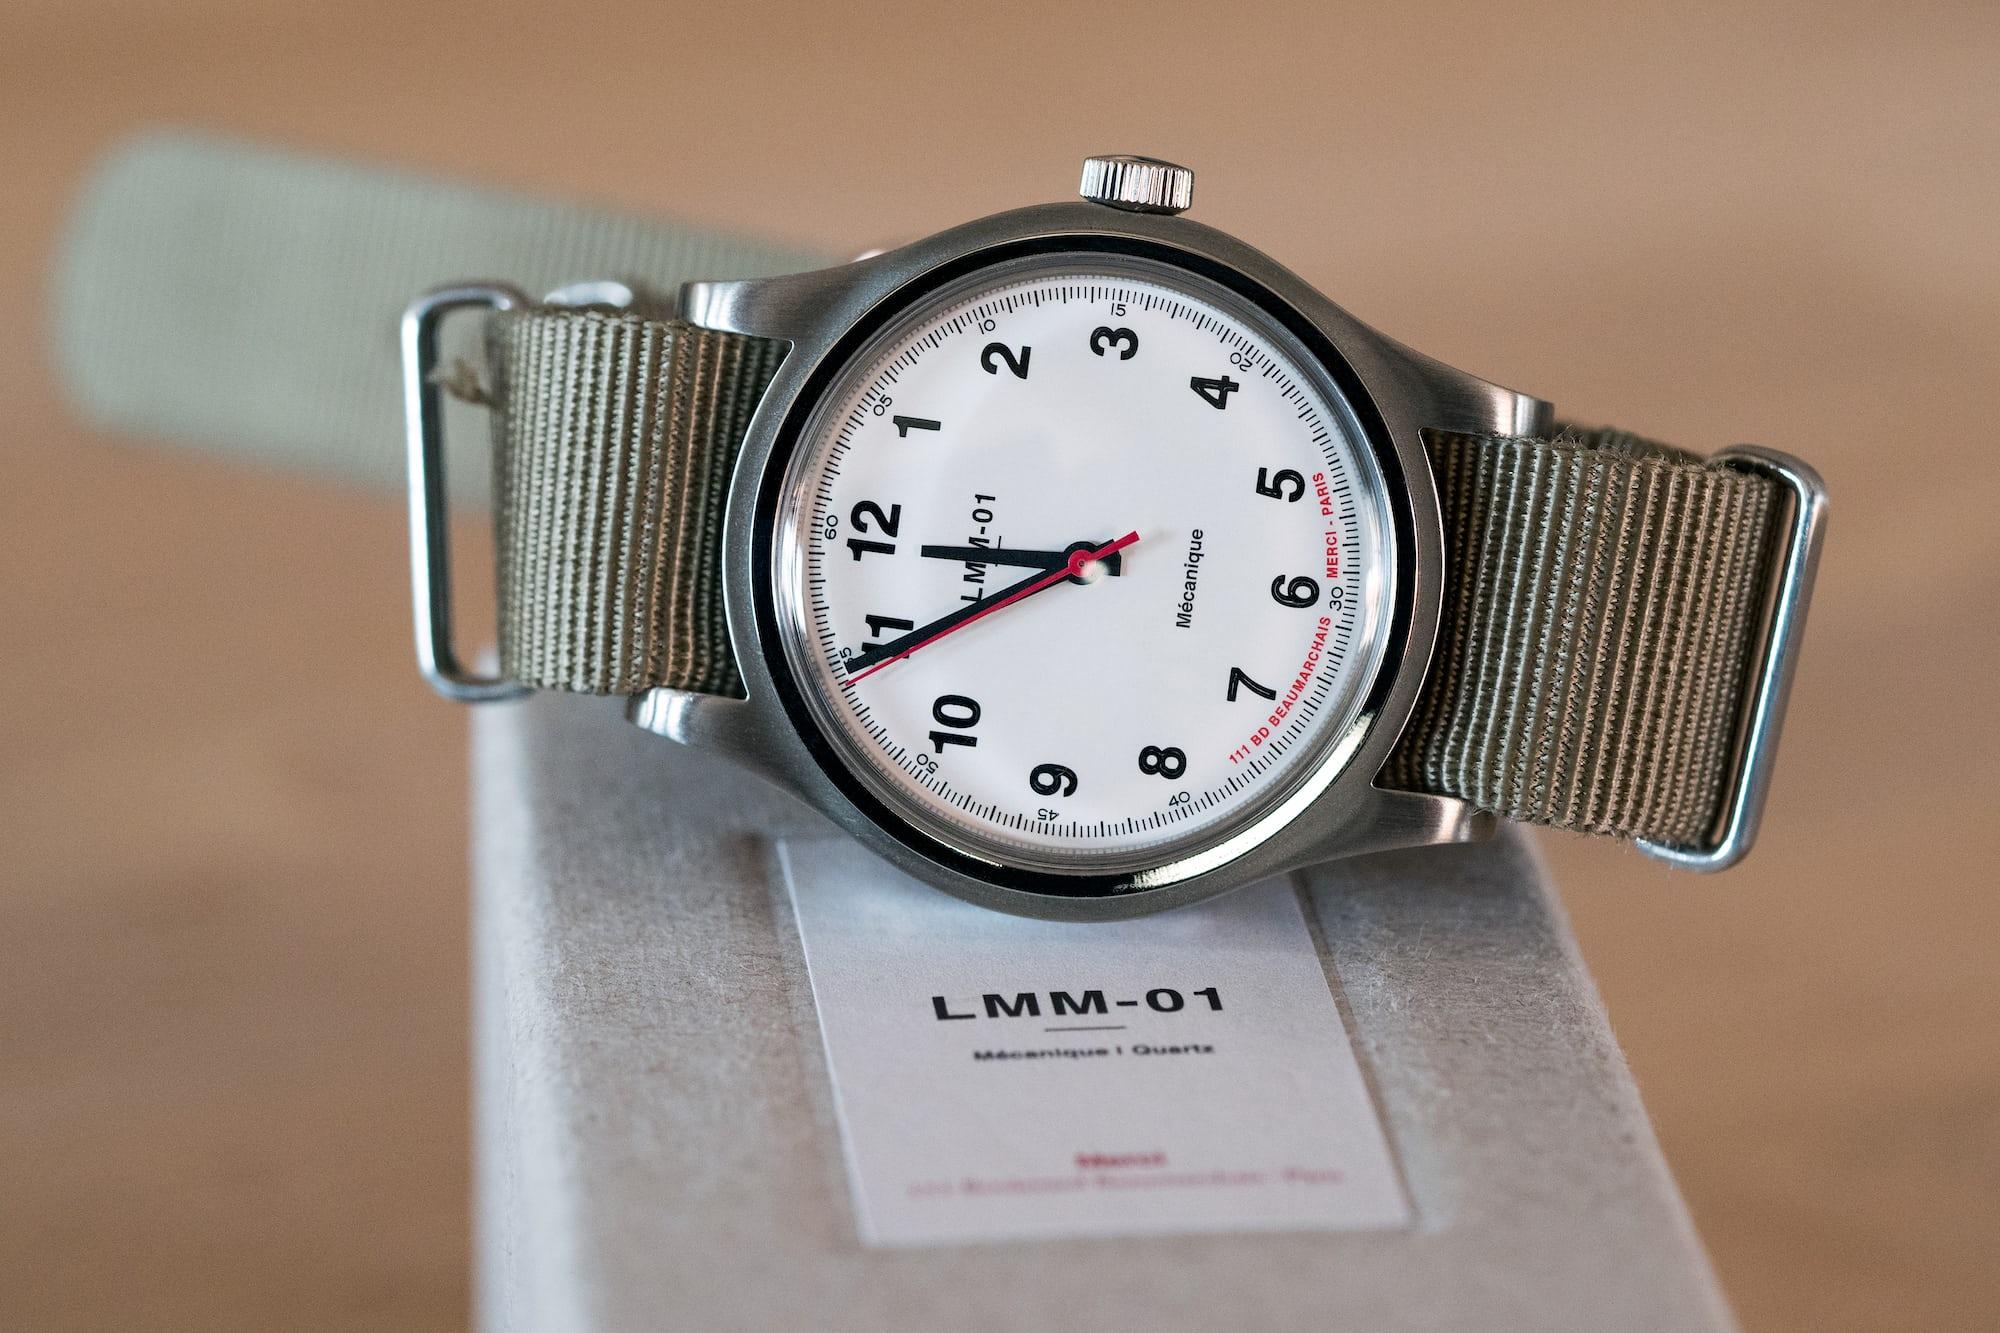 Merci LMM-01 white dial Introducing: The Merci LMM-01 Introducing: The Merci LMM-01 P8172228